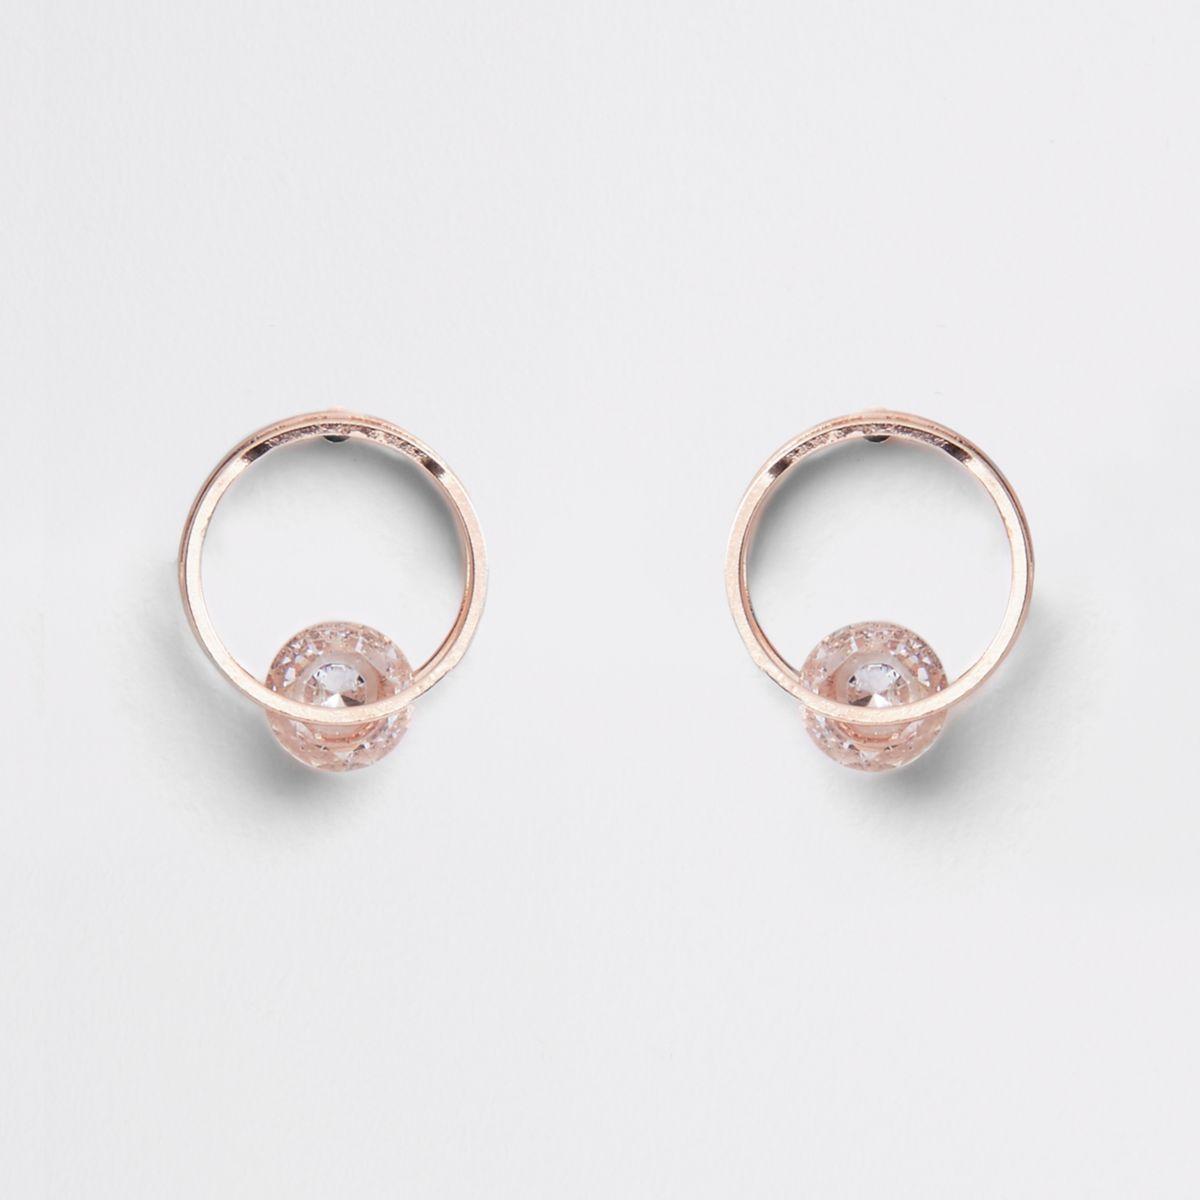 Rose gold tone double circle stud earrings